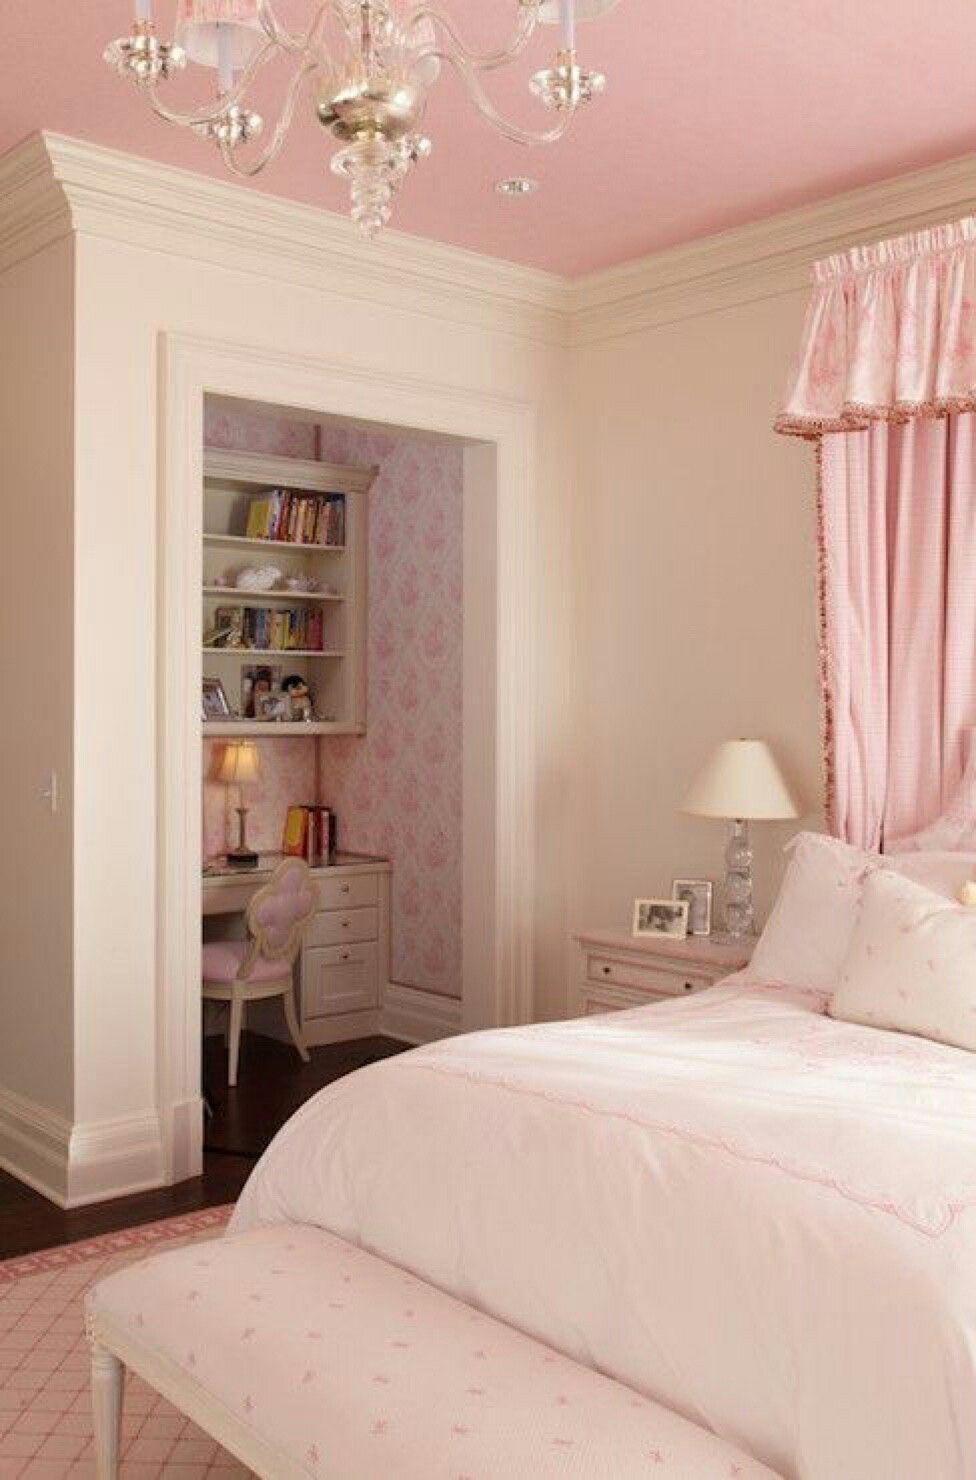 Pin by Mrs Furtado on monochromatic in 2019 | Pink bedroom ...